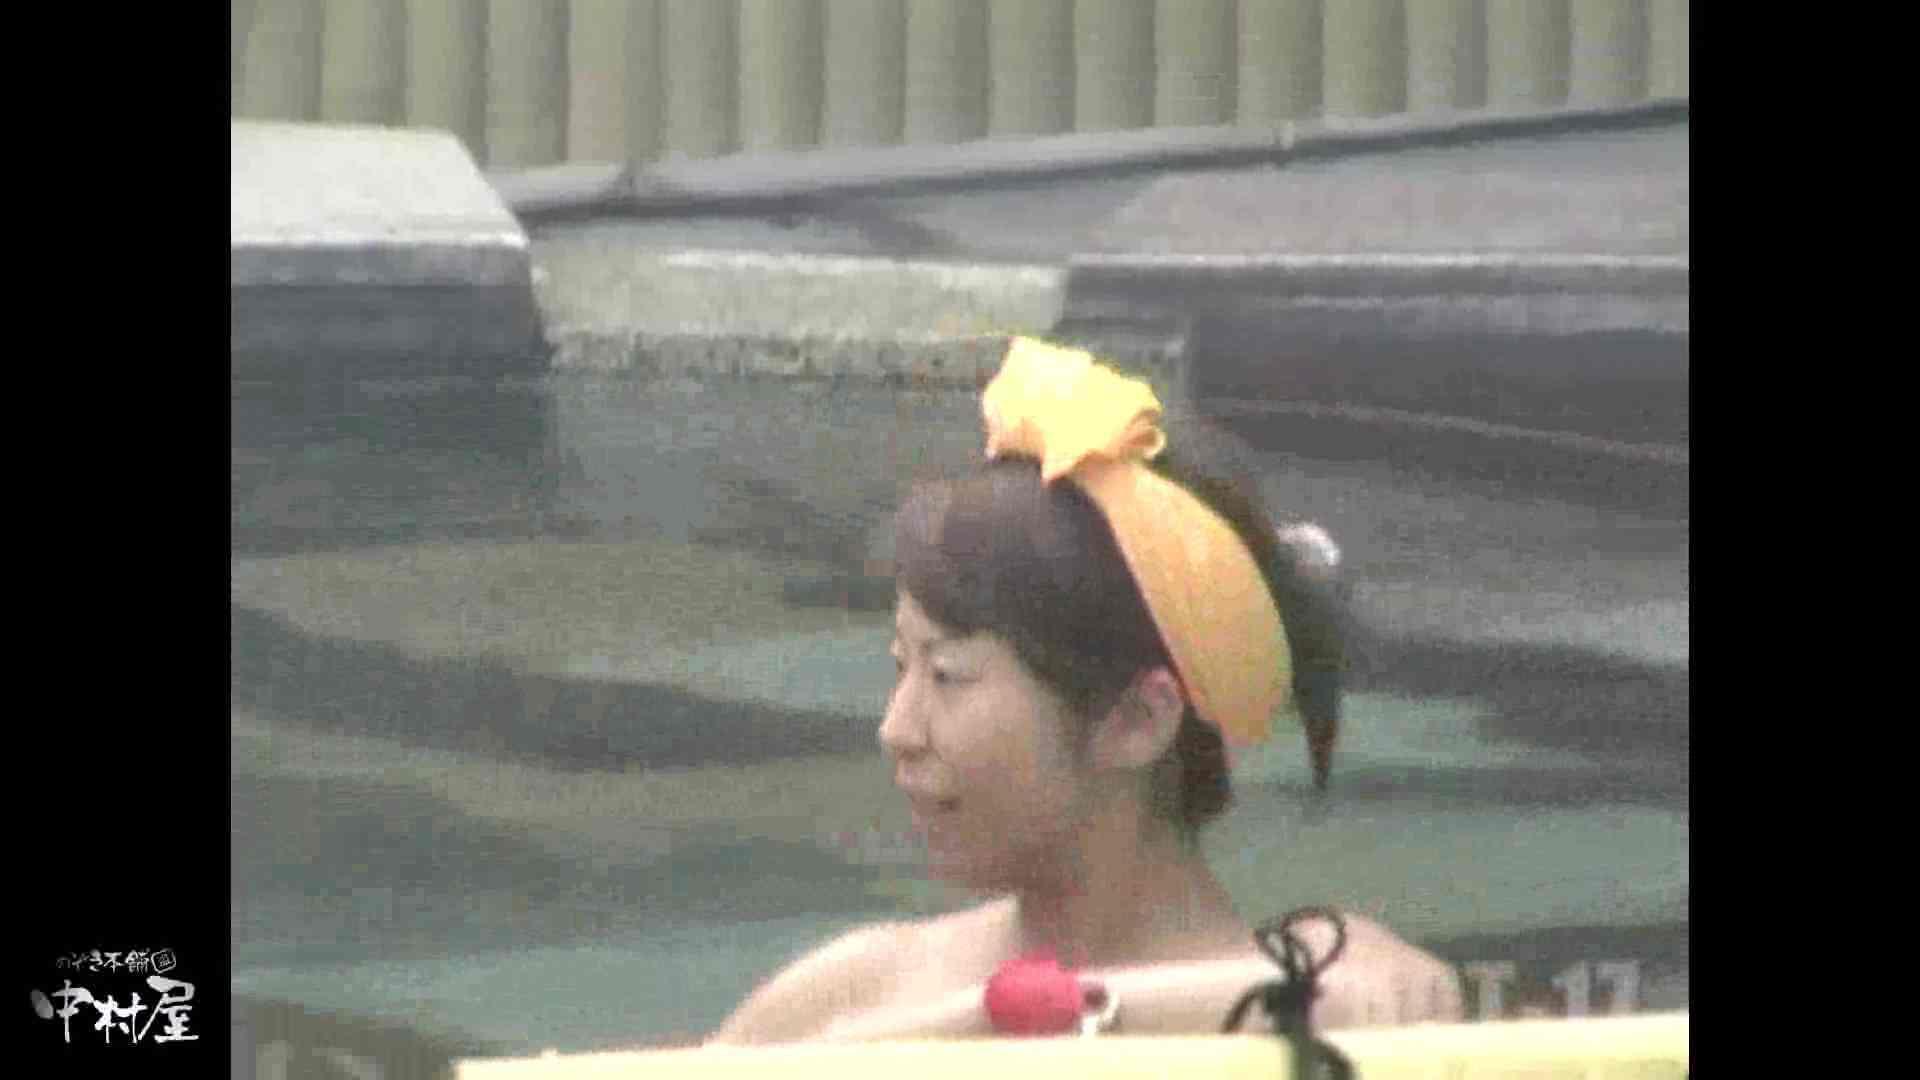 Aquaな露天風呂Vol.881潜入盗撮露天風呂十七判湯 其の五 潜入突撃  102pic 100